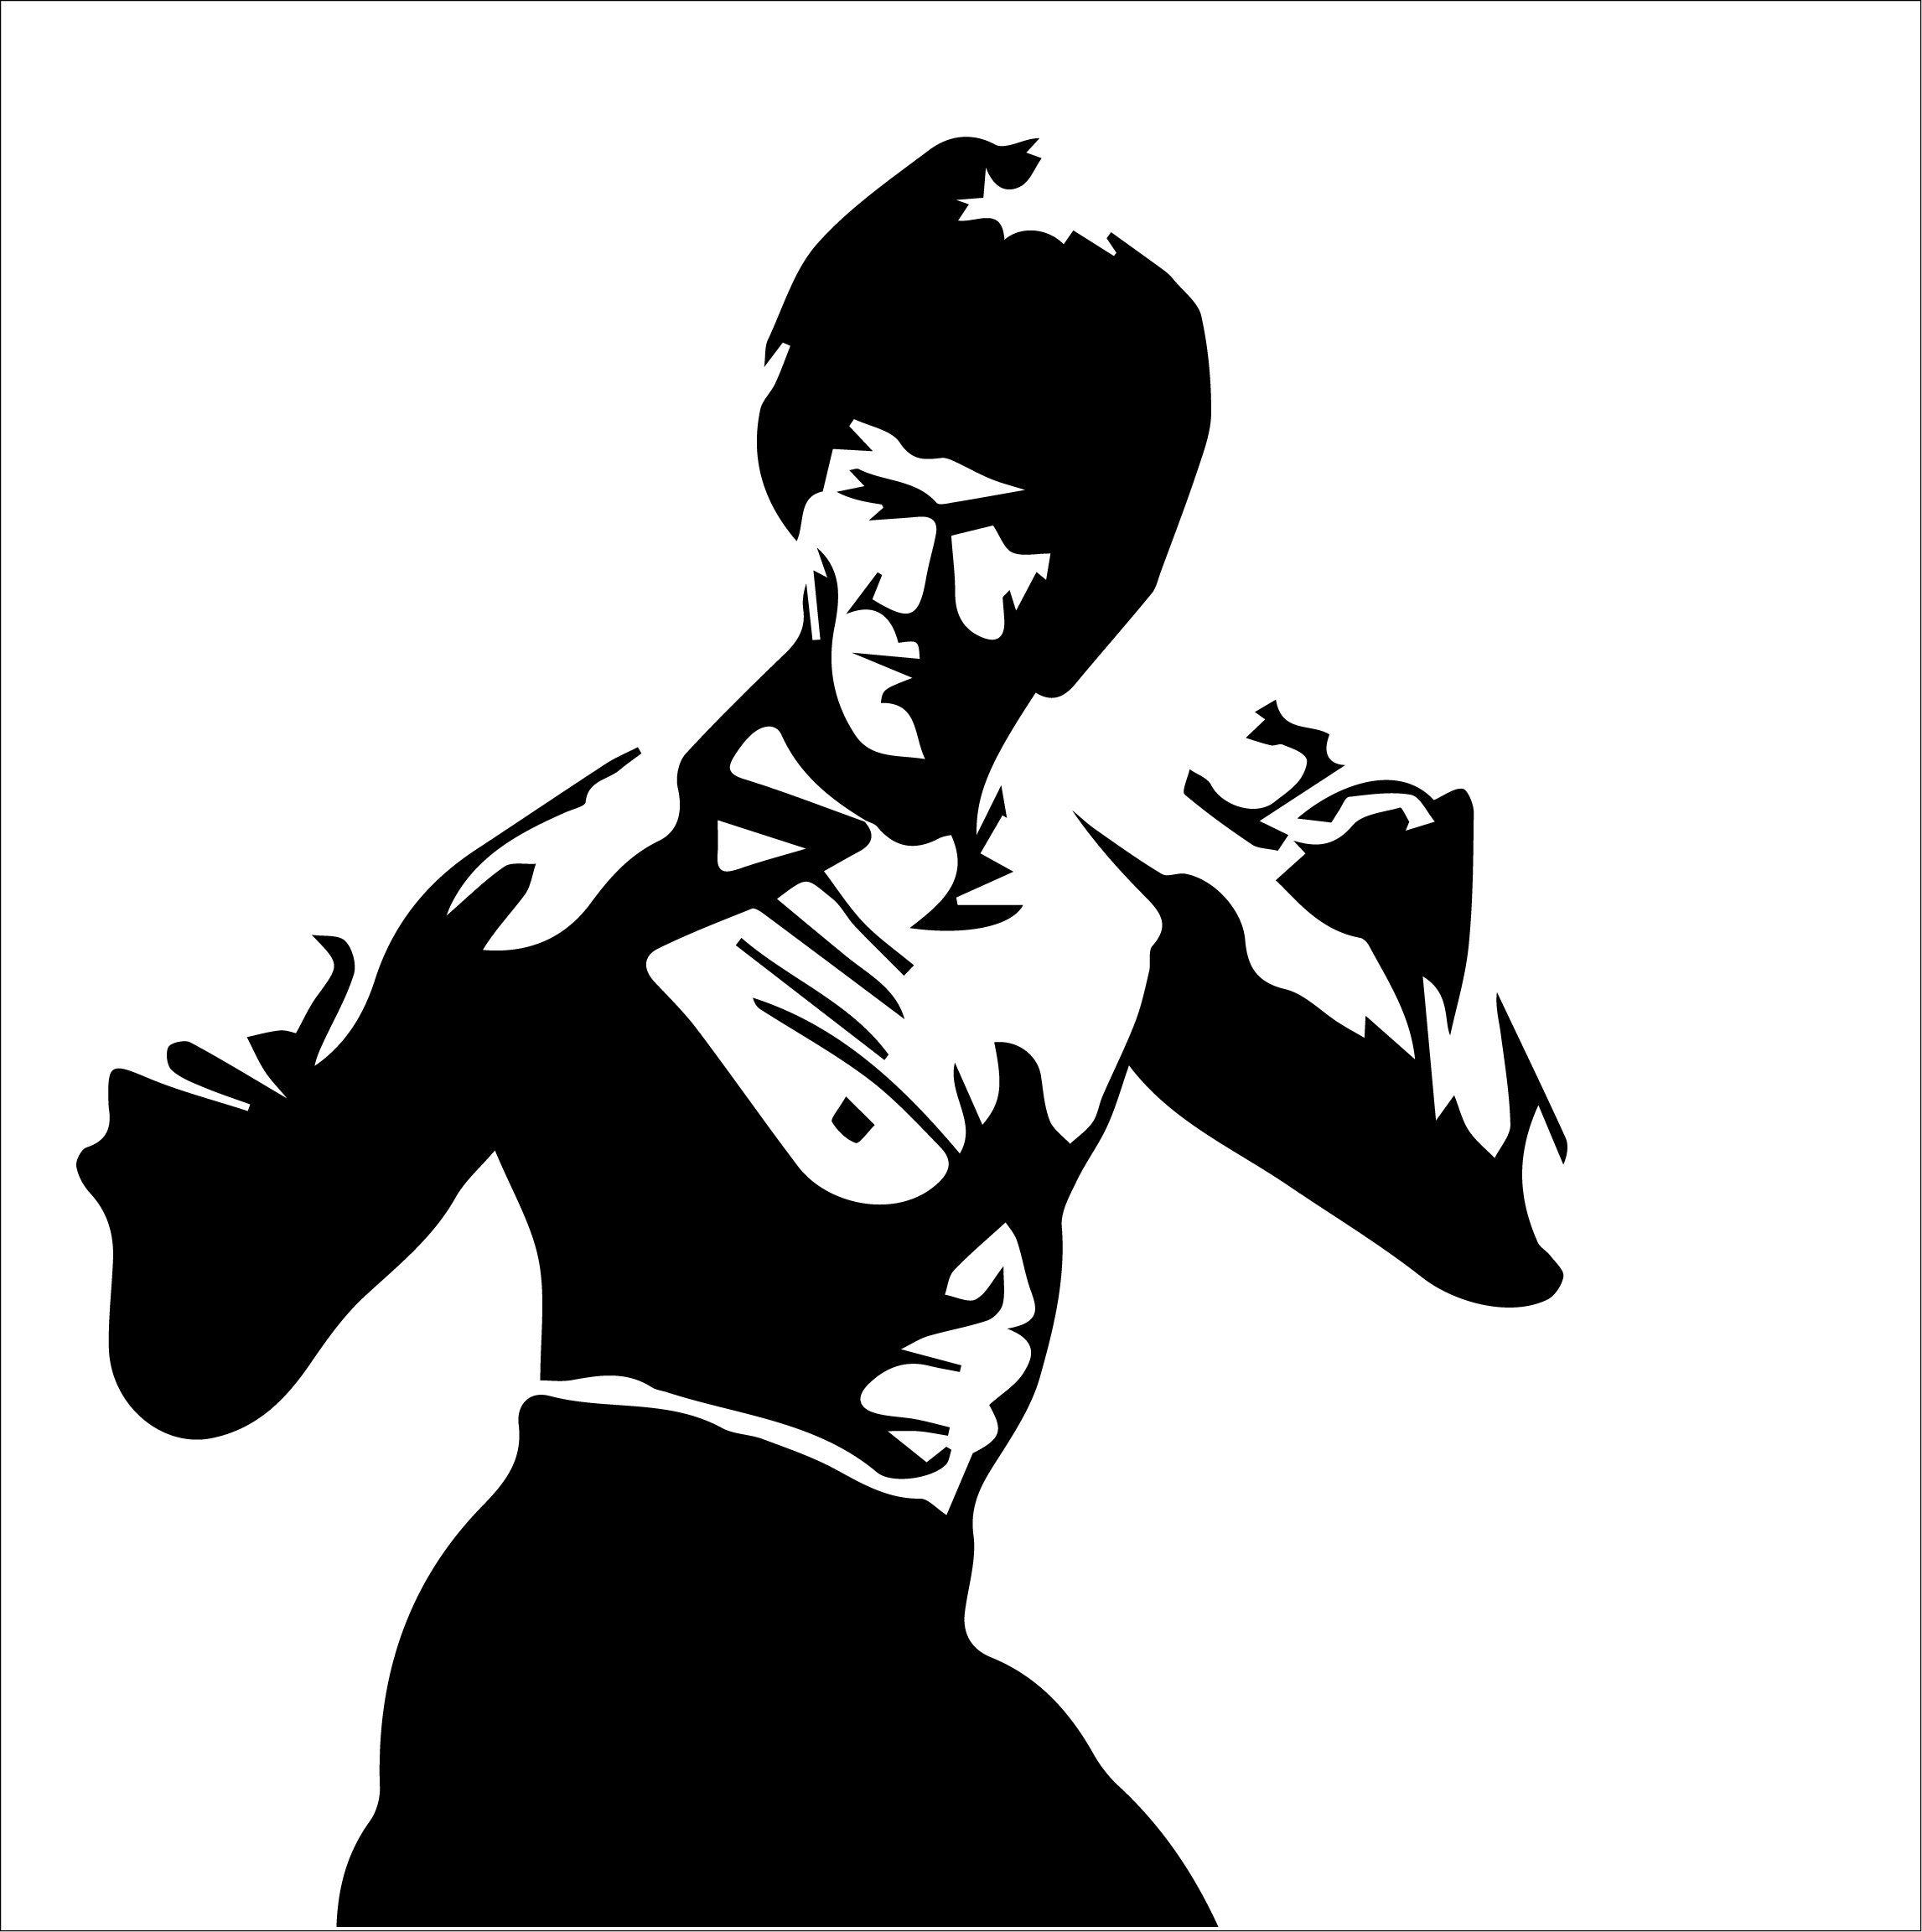 Pin By Sophia Norin On Gami Design Studio Bruce Lee Art Bruce Lee Che Guevara Art